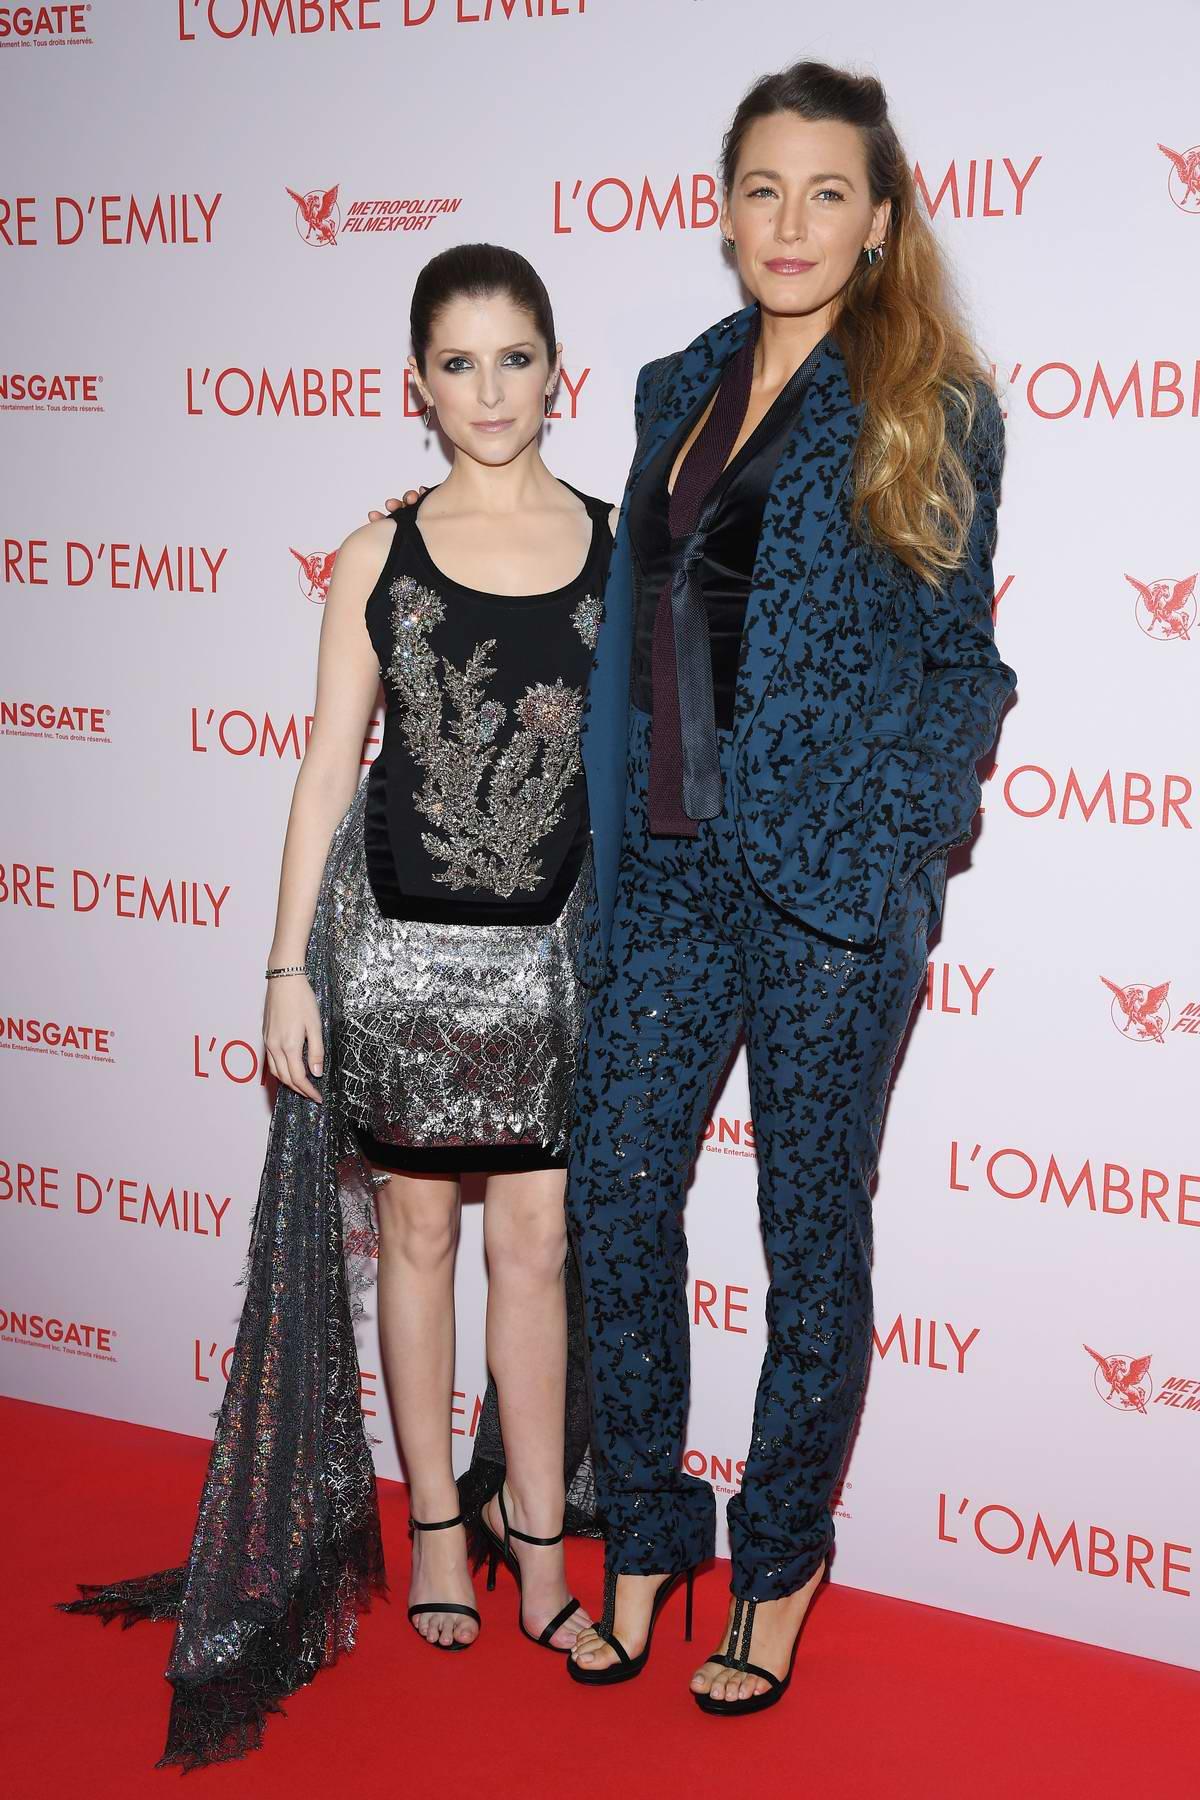 Anna Kendrick and Blake Lively attends 'L'Ombre D'Emilie - A Simple Favor' Paris Premiere at UGC Normandie in Paris, France